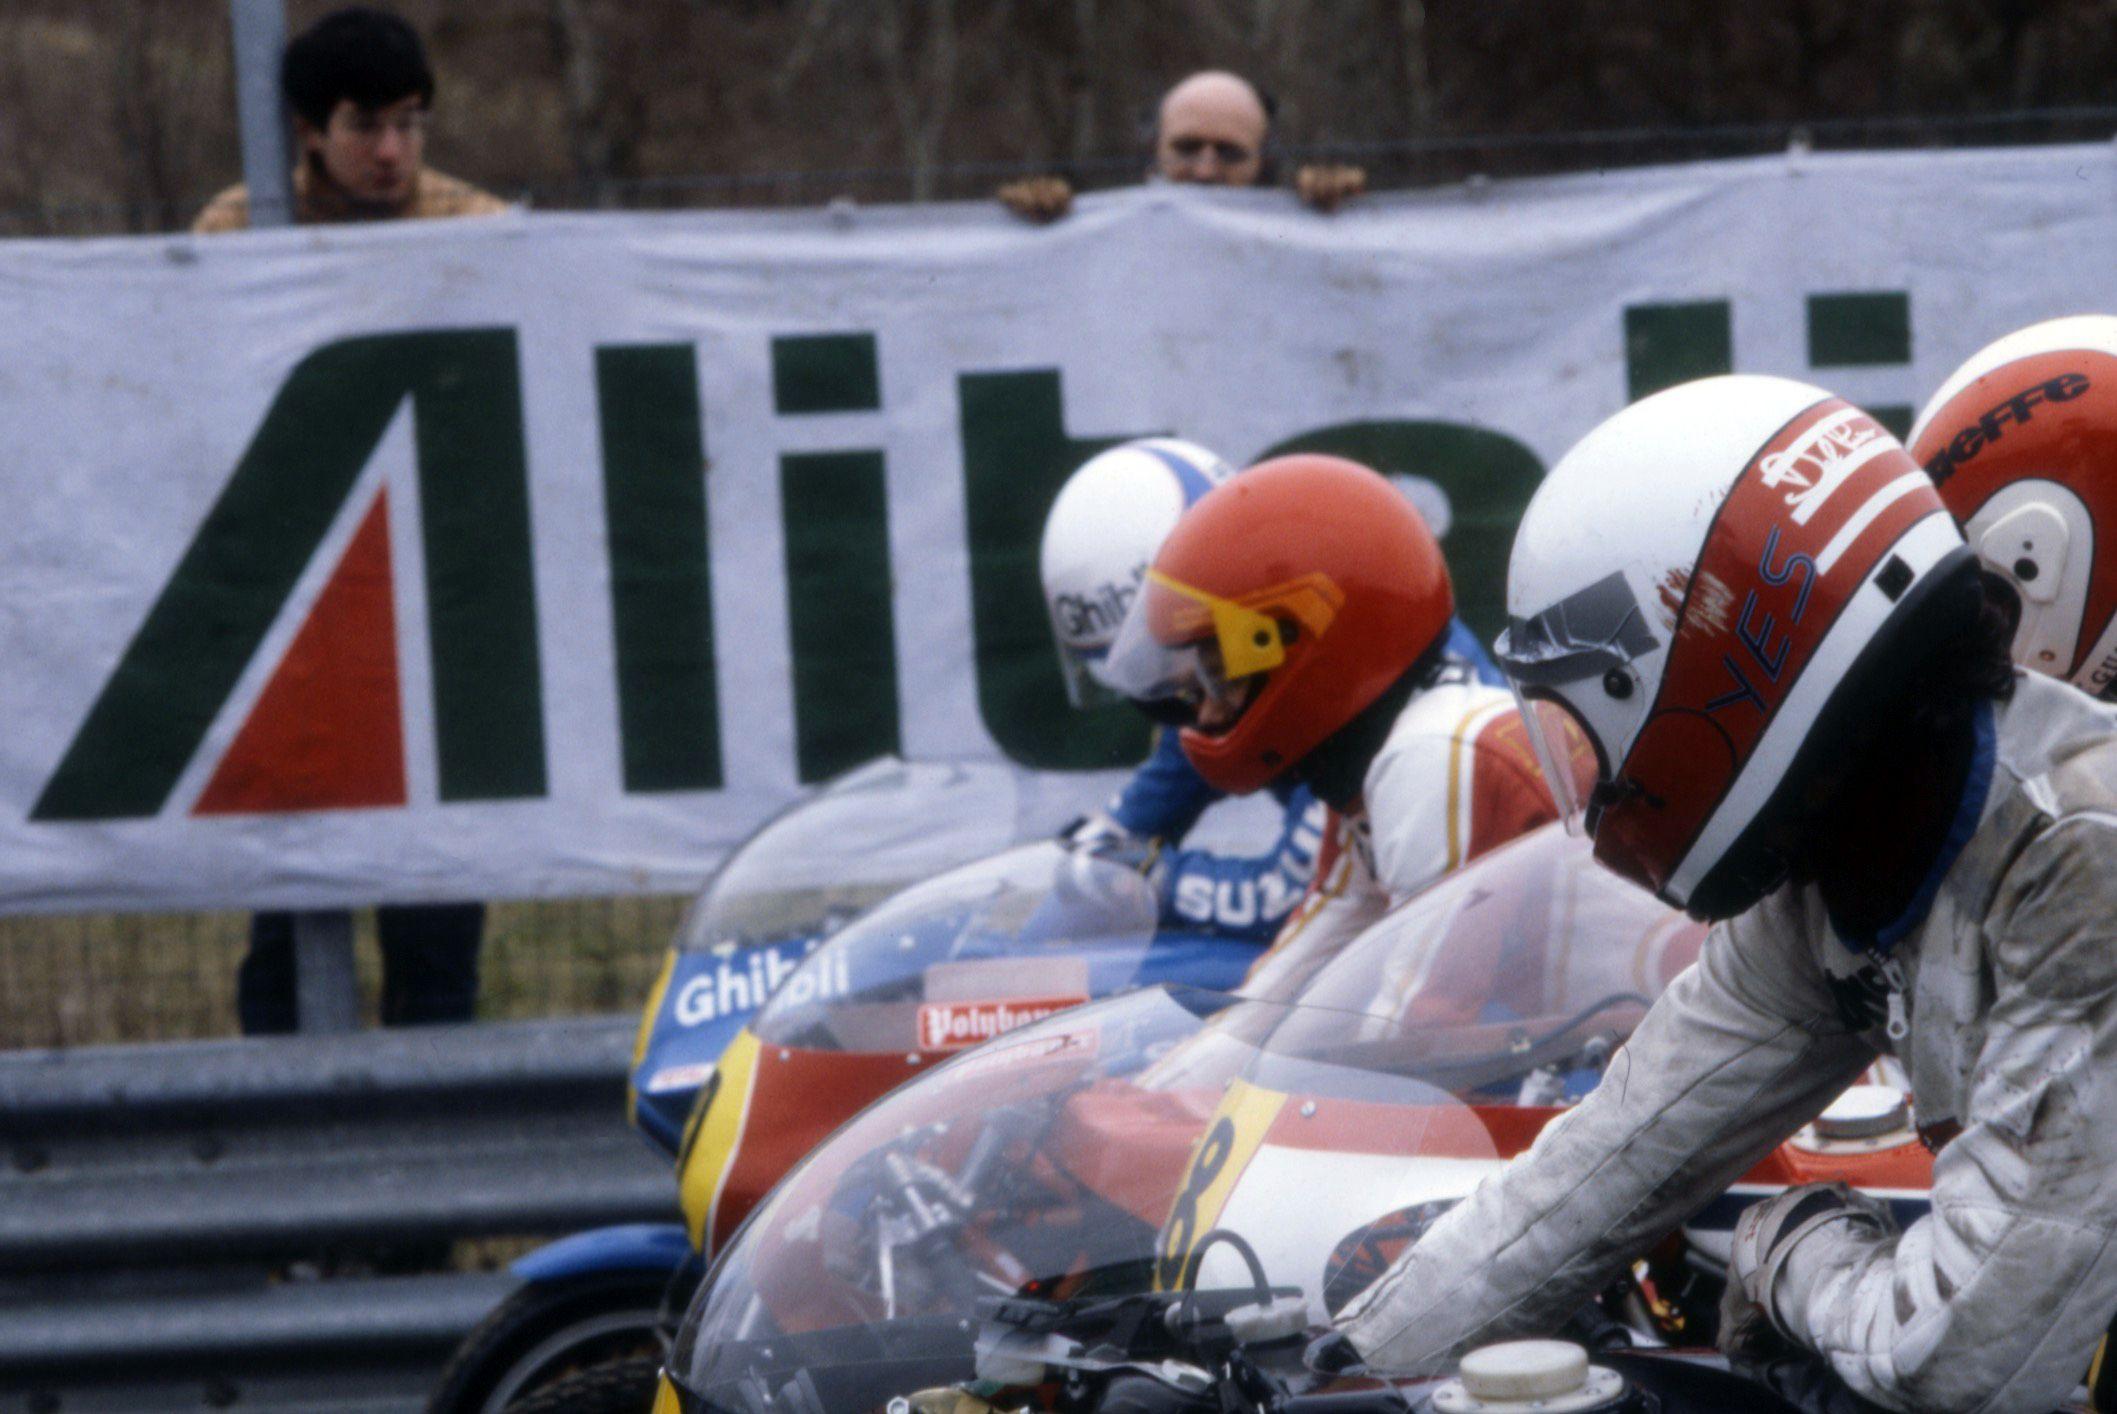 Alitalia for motorbike championship